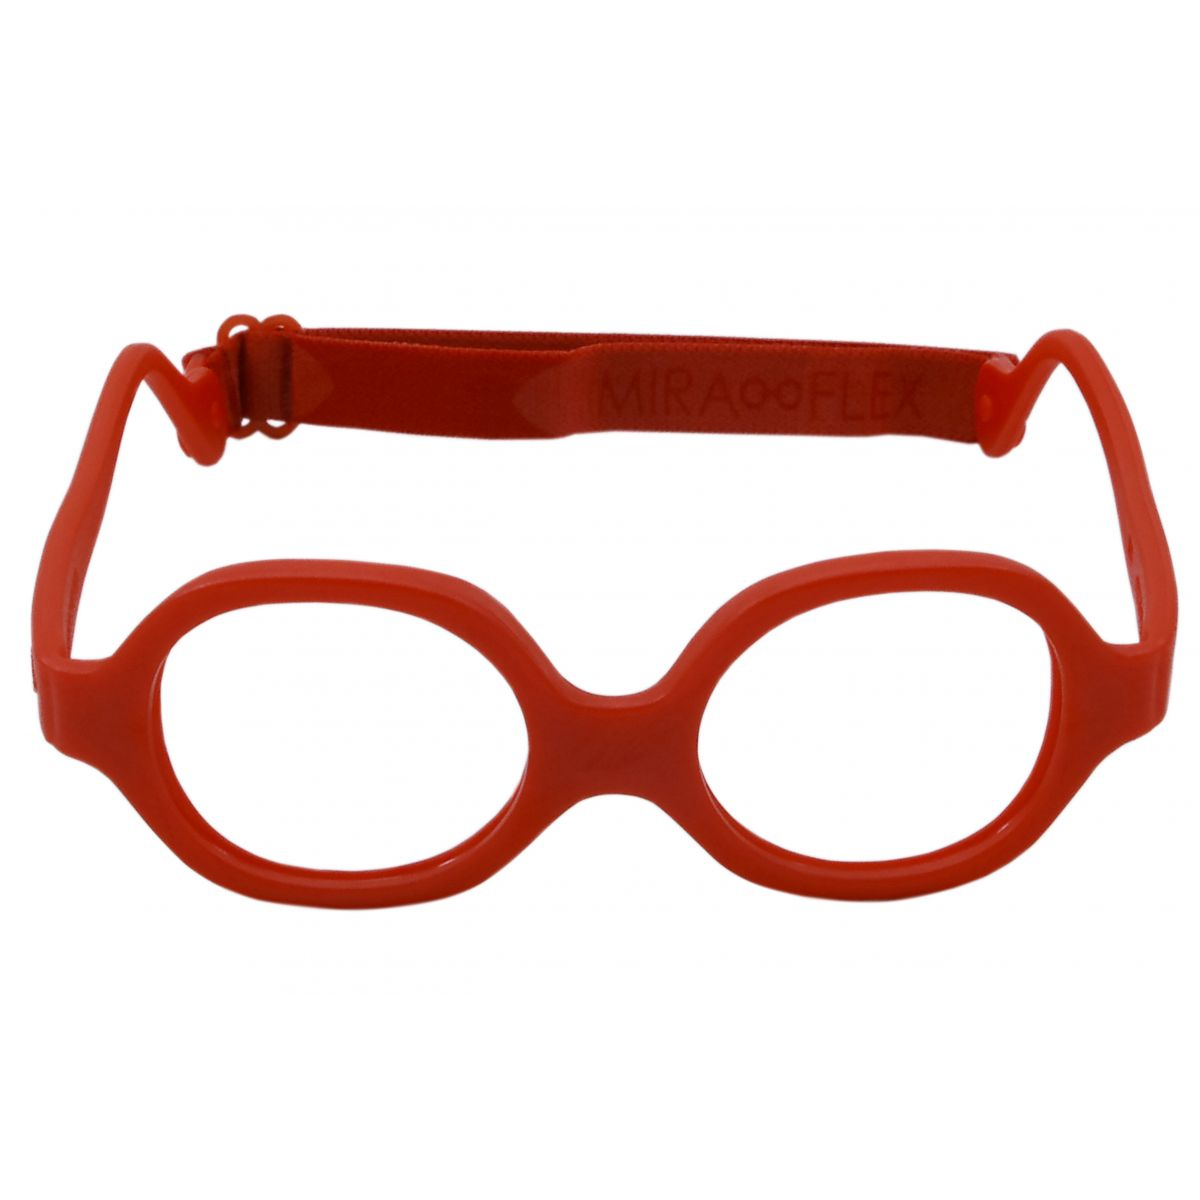 a77c6671b Óculos De Grau Infantil Miraflex Silicone 2 a 5 Anos Maxi Baby Tam ...